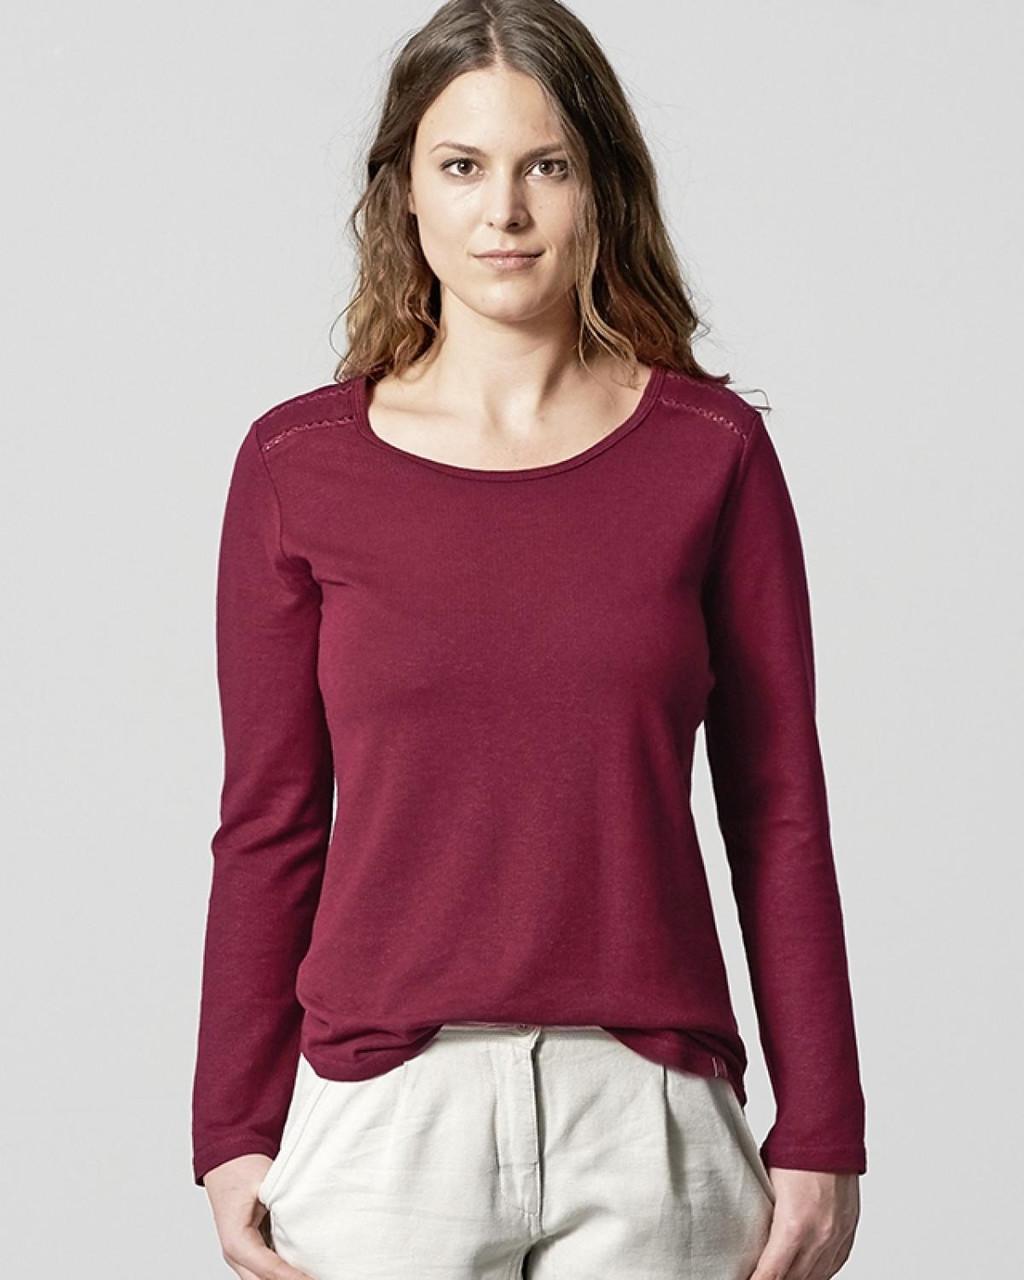 Glara Konopné dámské bio triko s průstřihy 568630